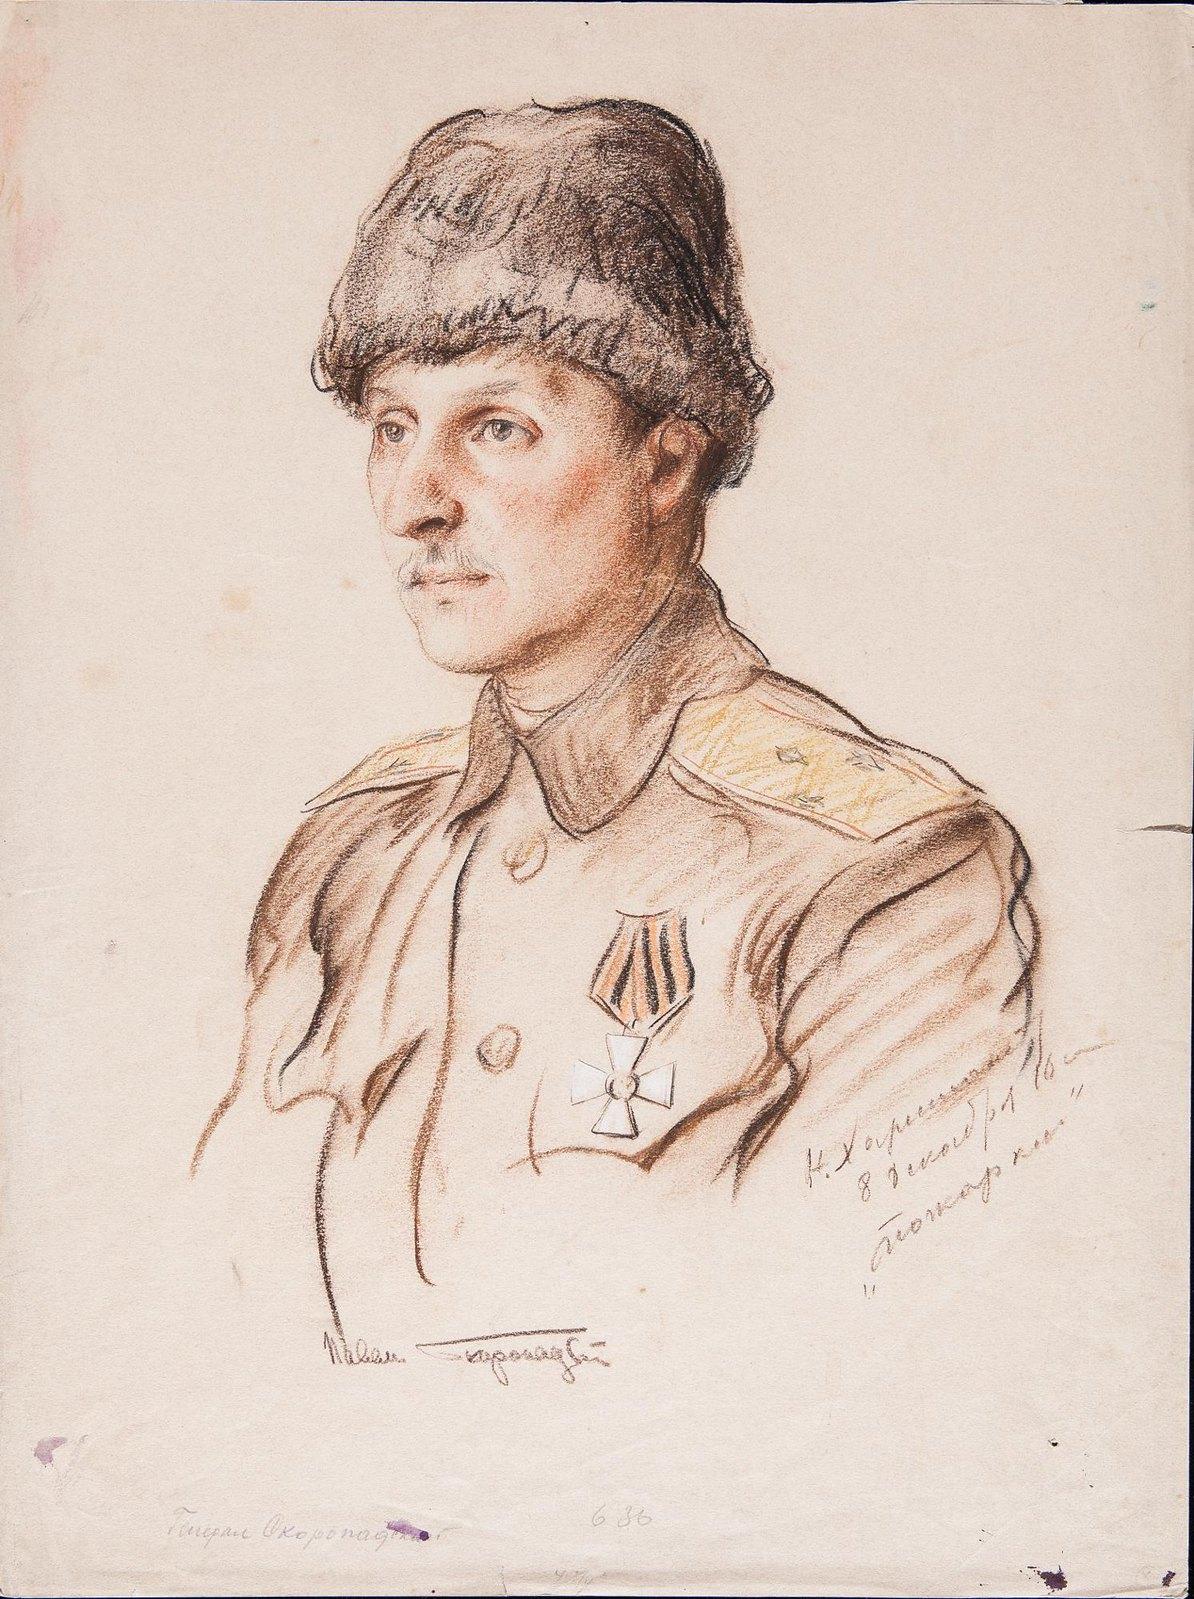 1916. Портрет генерал-лейтенанта Павла Петровича Скоропадского (1873-1945)